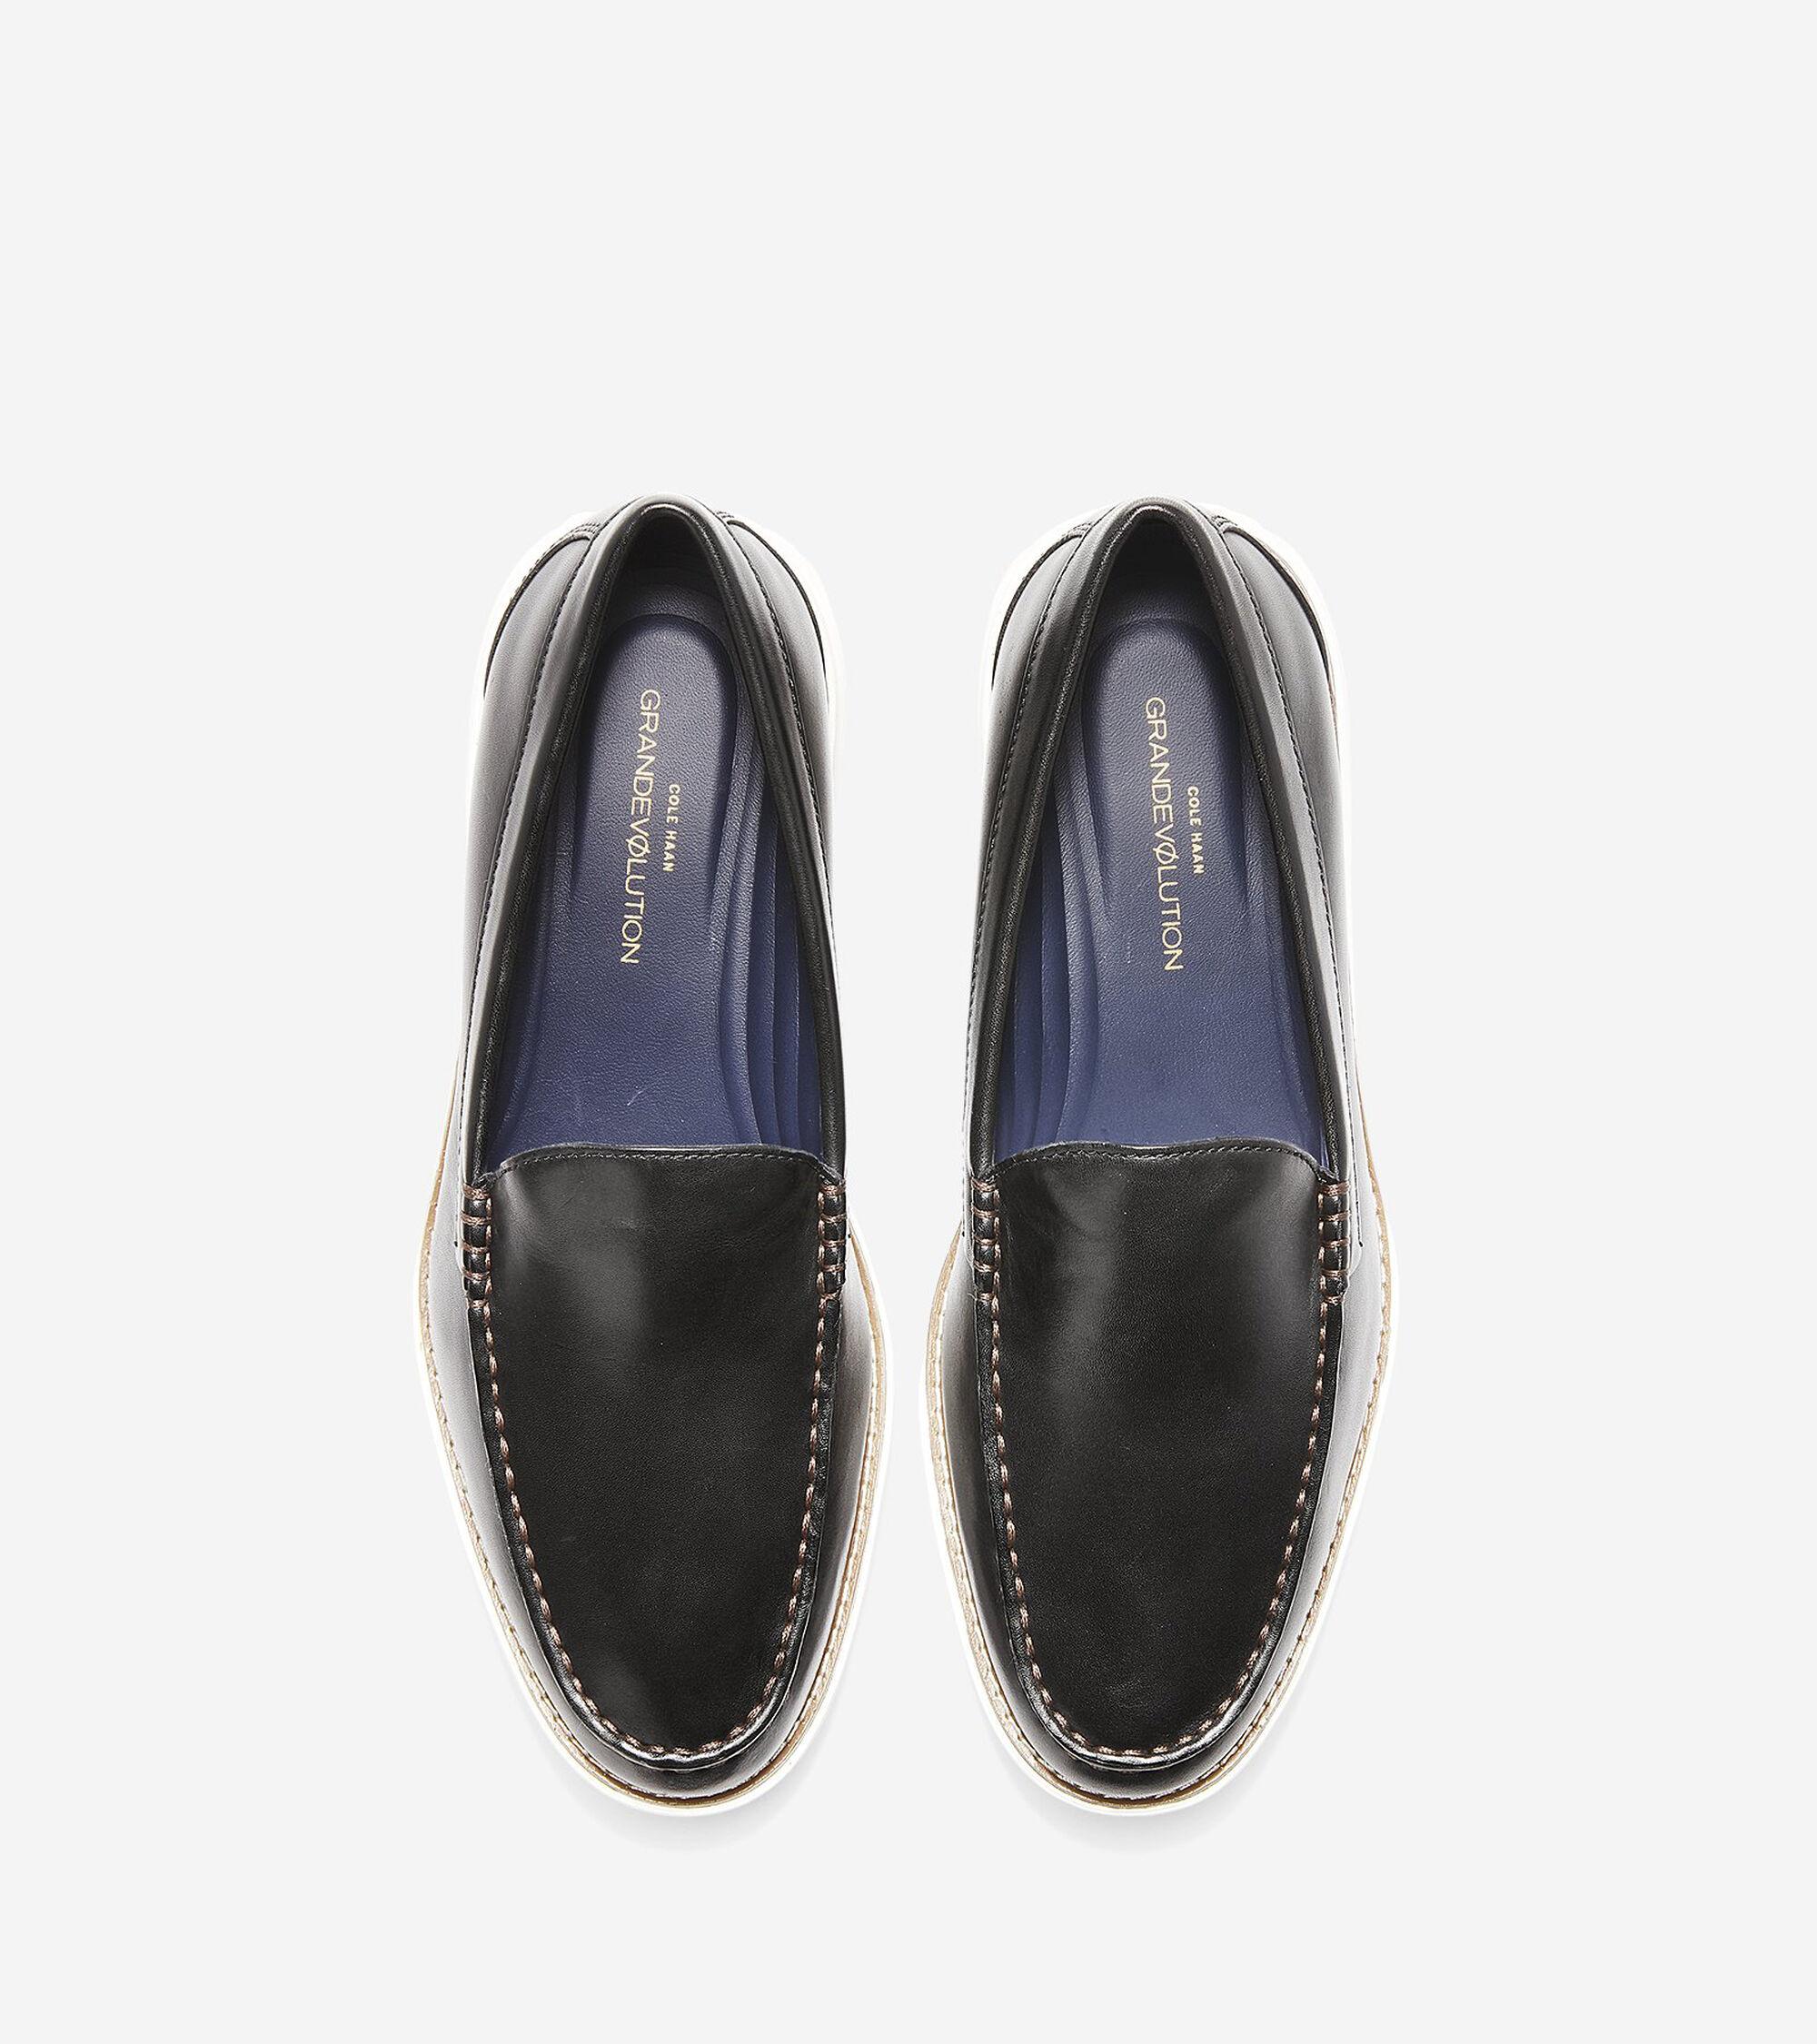 585d20313ac Men s GrandEvolution Venetian Loafers in Black-Ivory